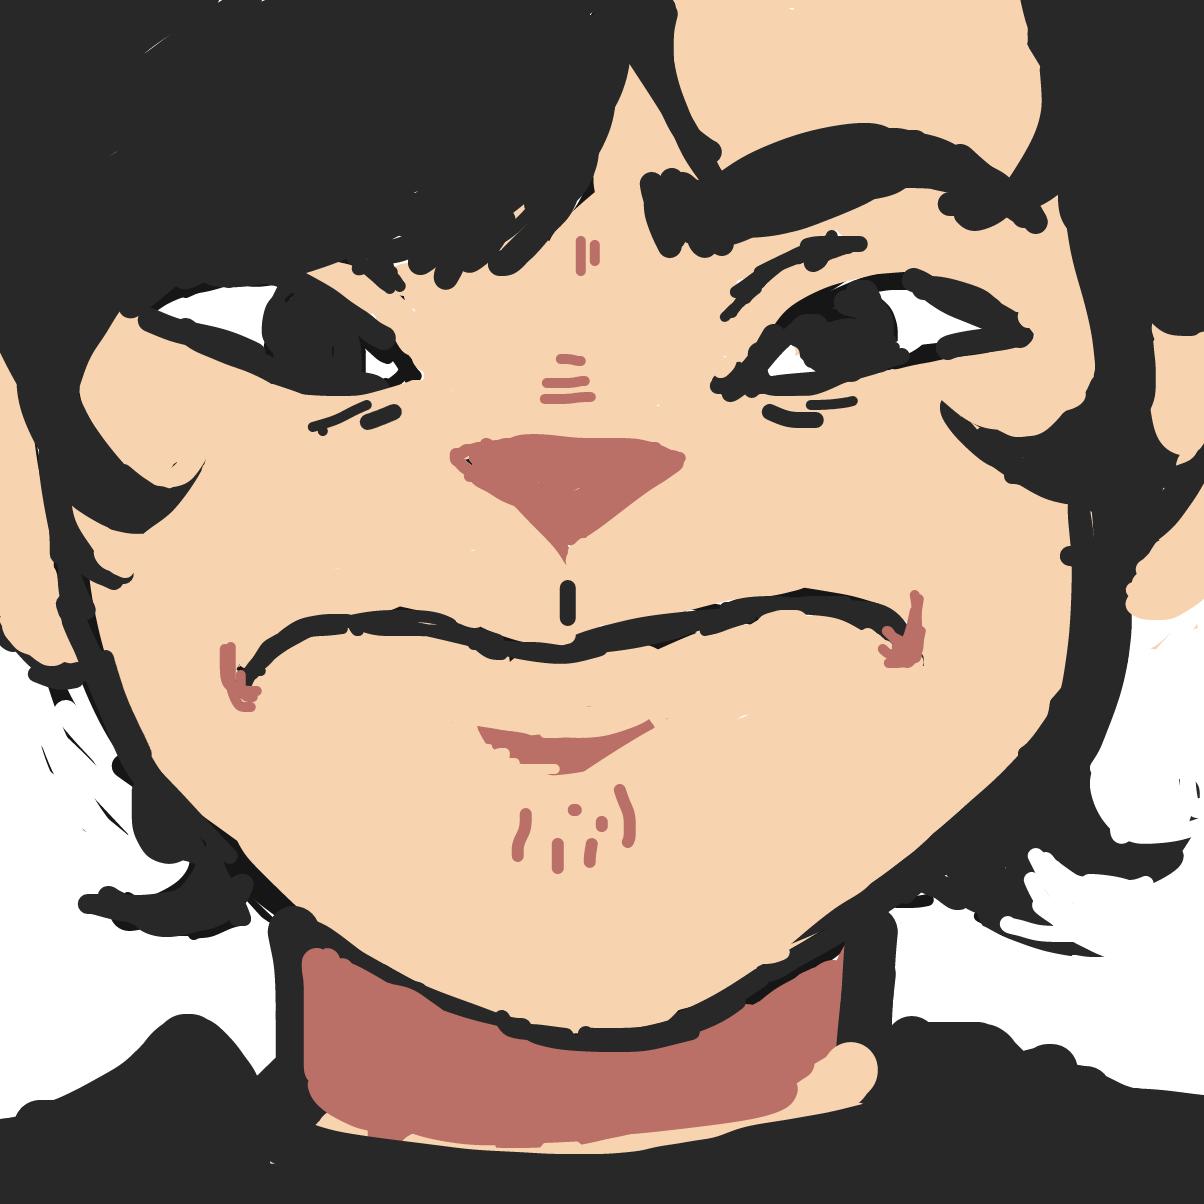 Profile picture for the comic artist, dumbrump